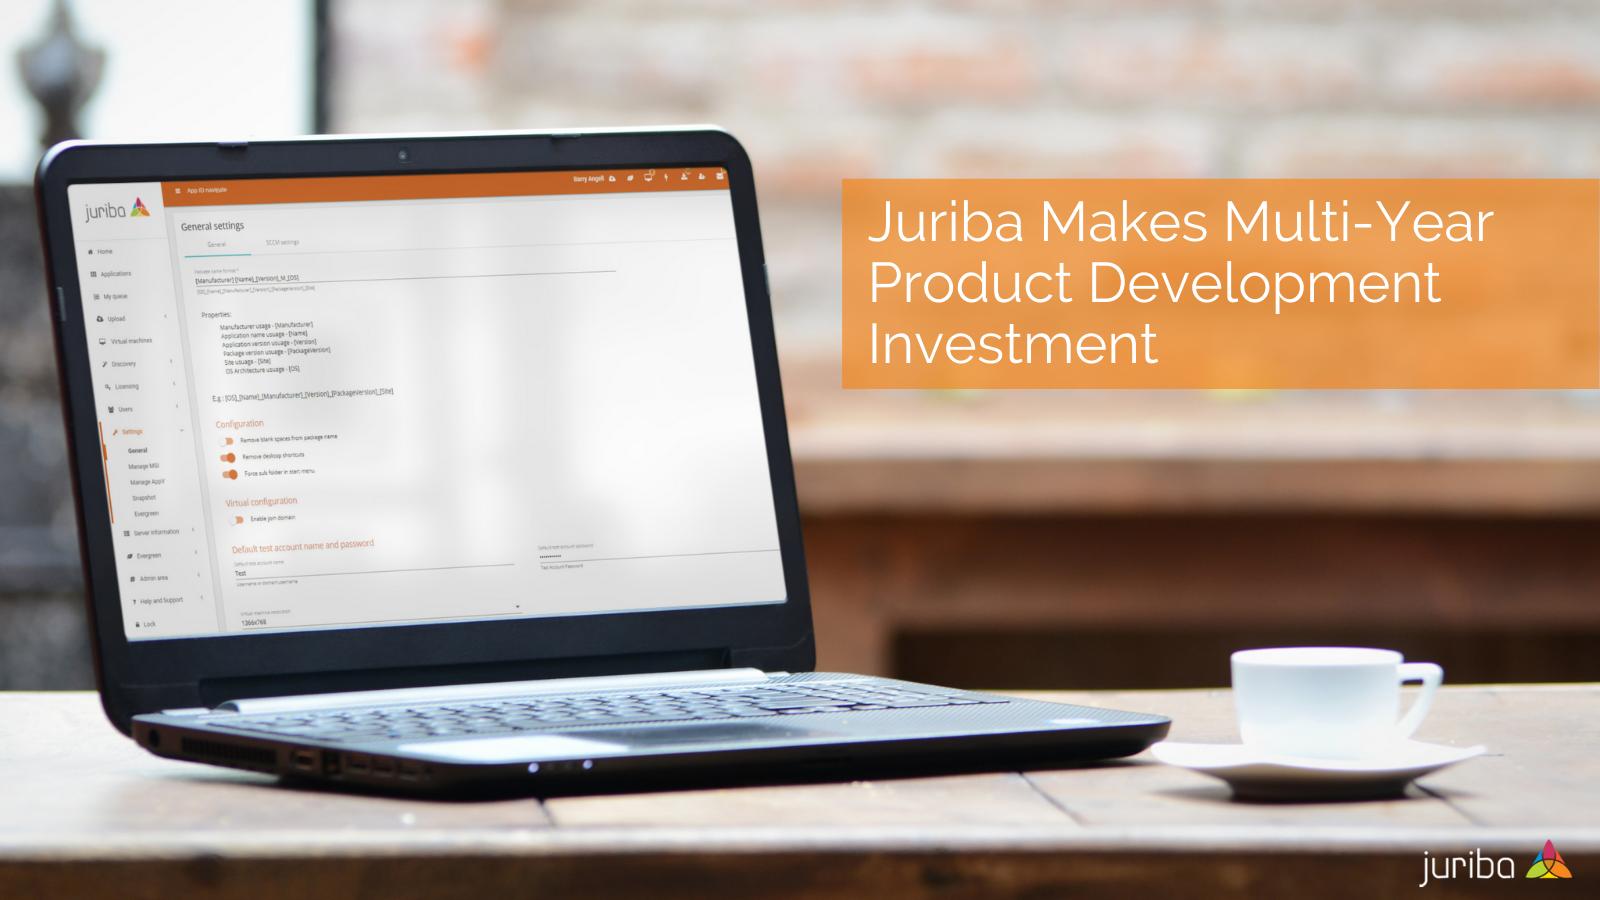 Juriba Makes Multi-Year Product Development Investment